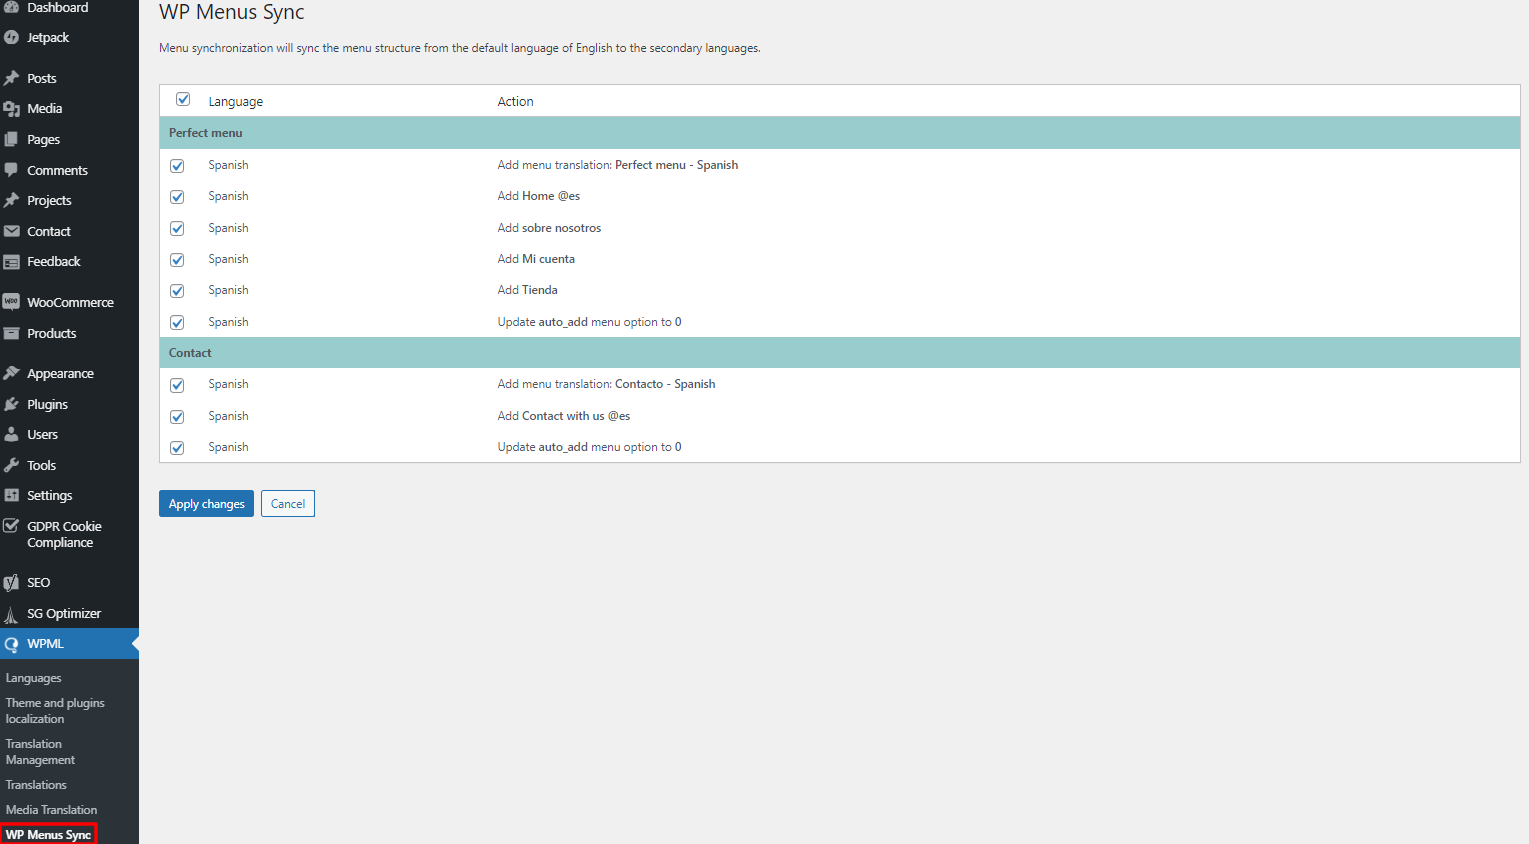 WPML menu syncing